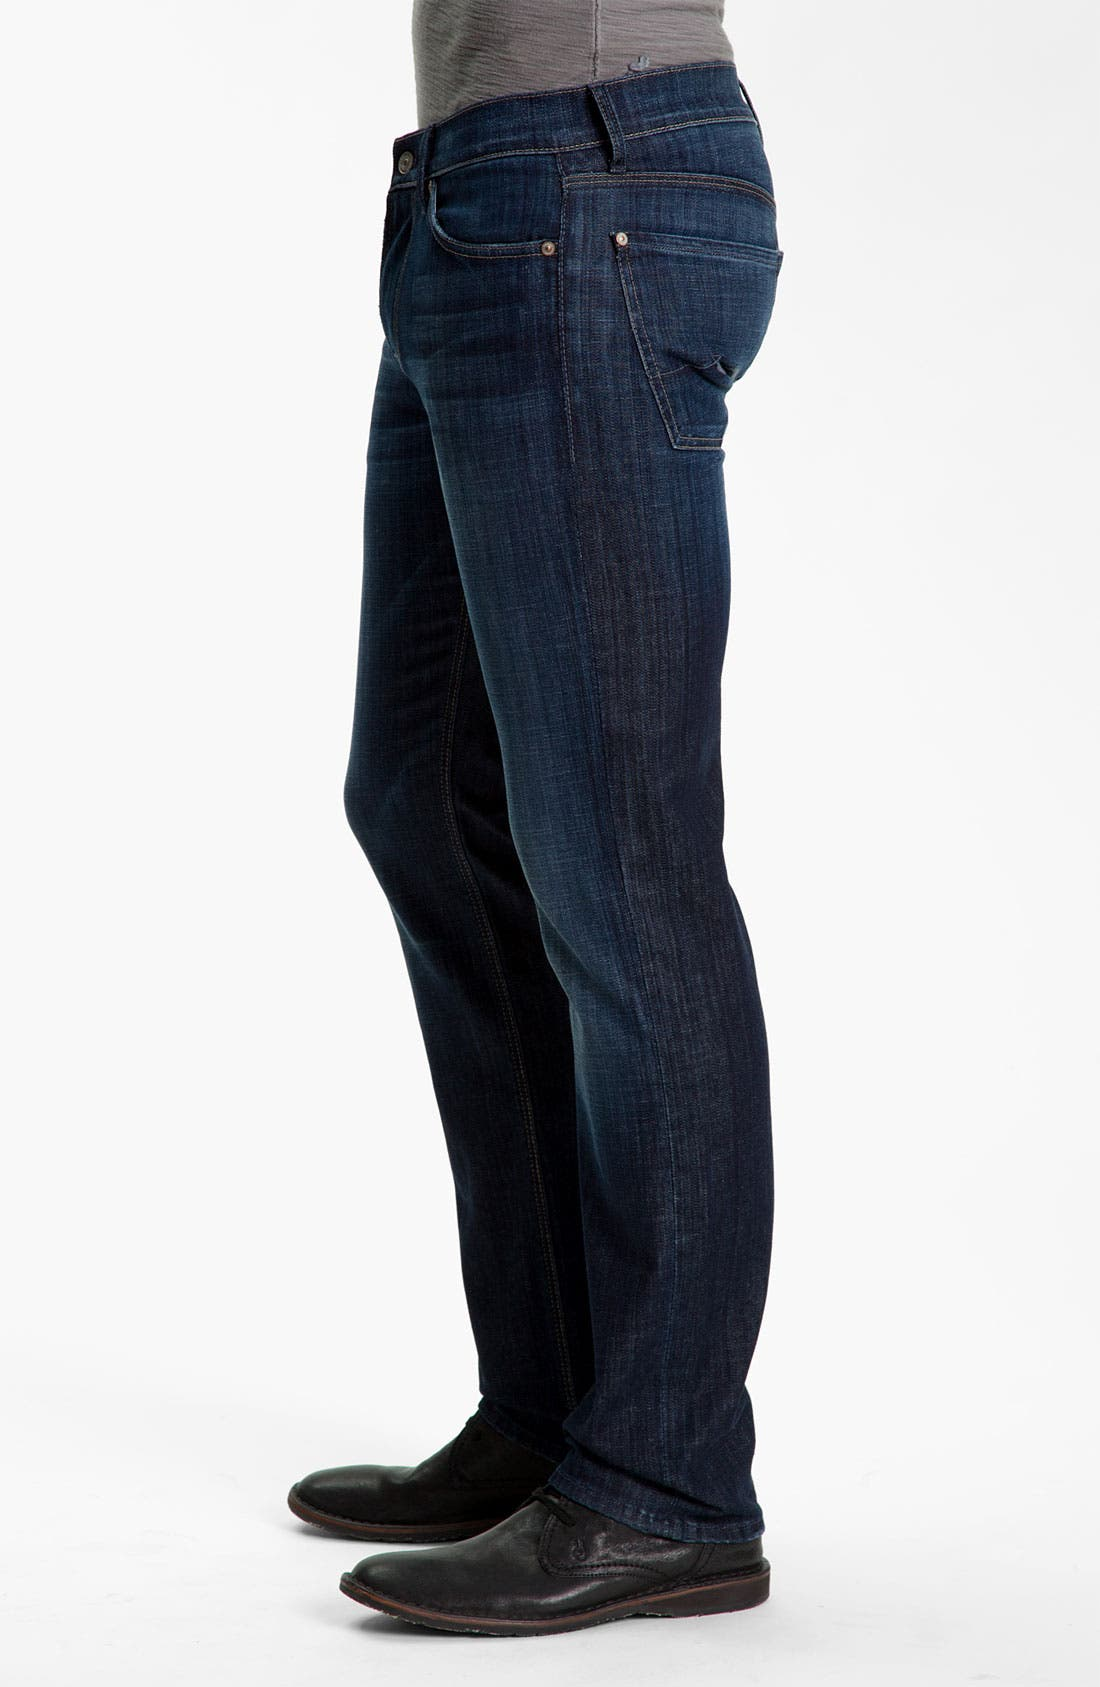 Slimmy Slim Fit Jeans,                             Alternate thumbnail 3, color,                             LOS ANGELES DARK